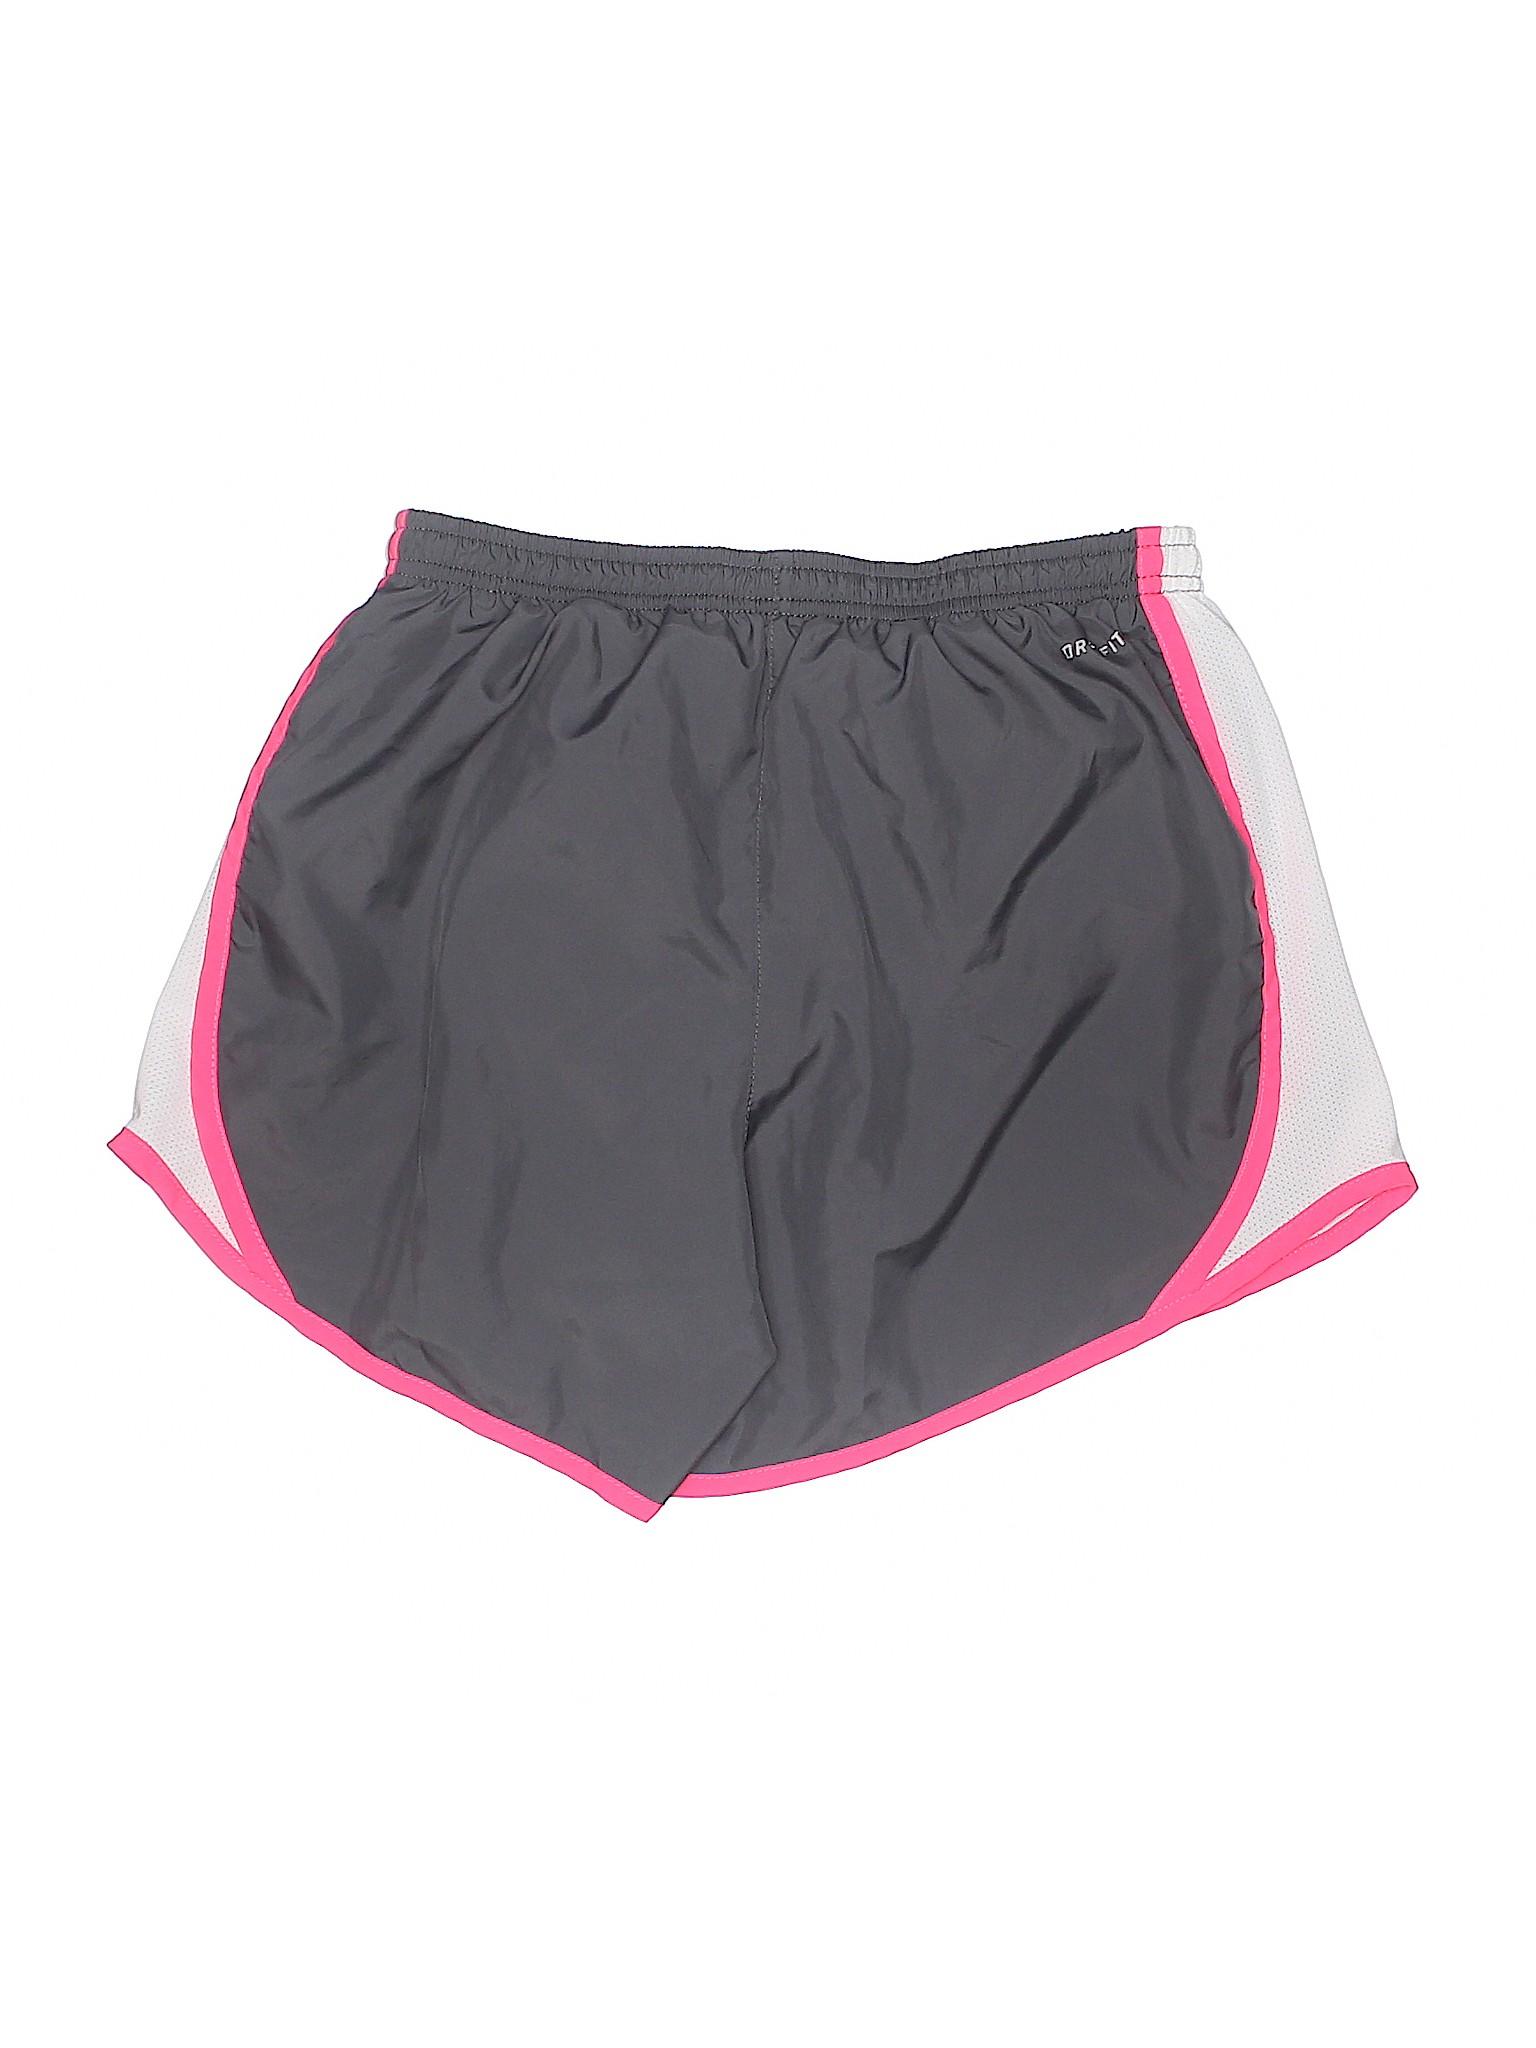 Boutique Shorts Boutique Athletic Shorts Athletic Nike Boutique Boutique Athletic Shorts Nike Nike Athletic Nike paxBwtdpq